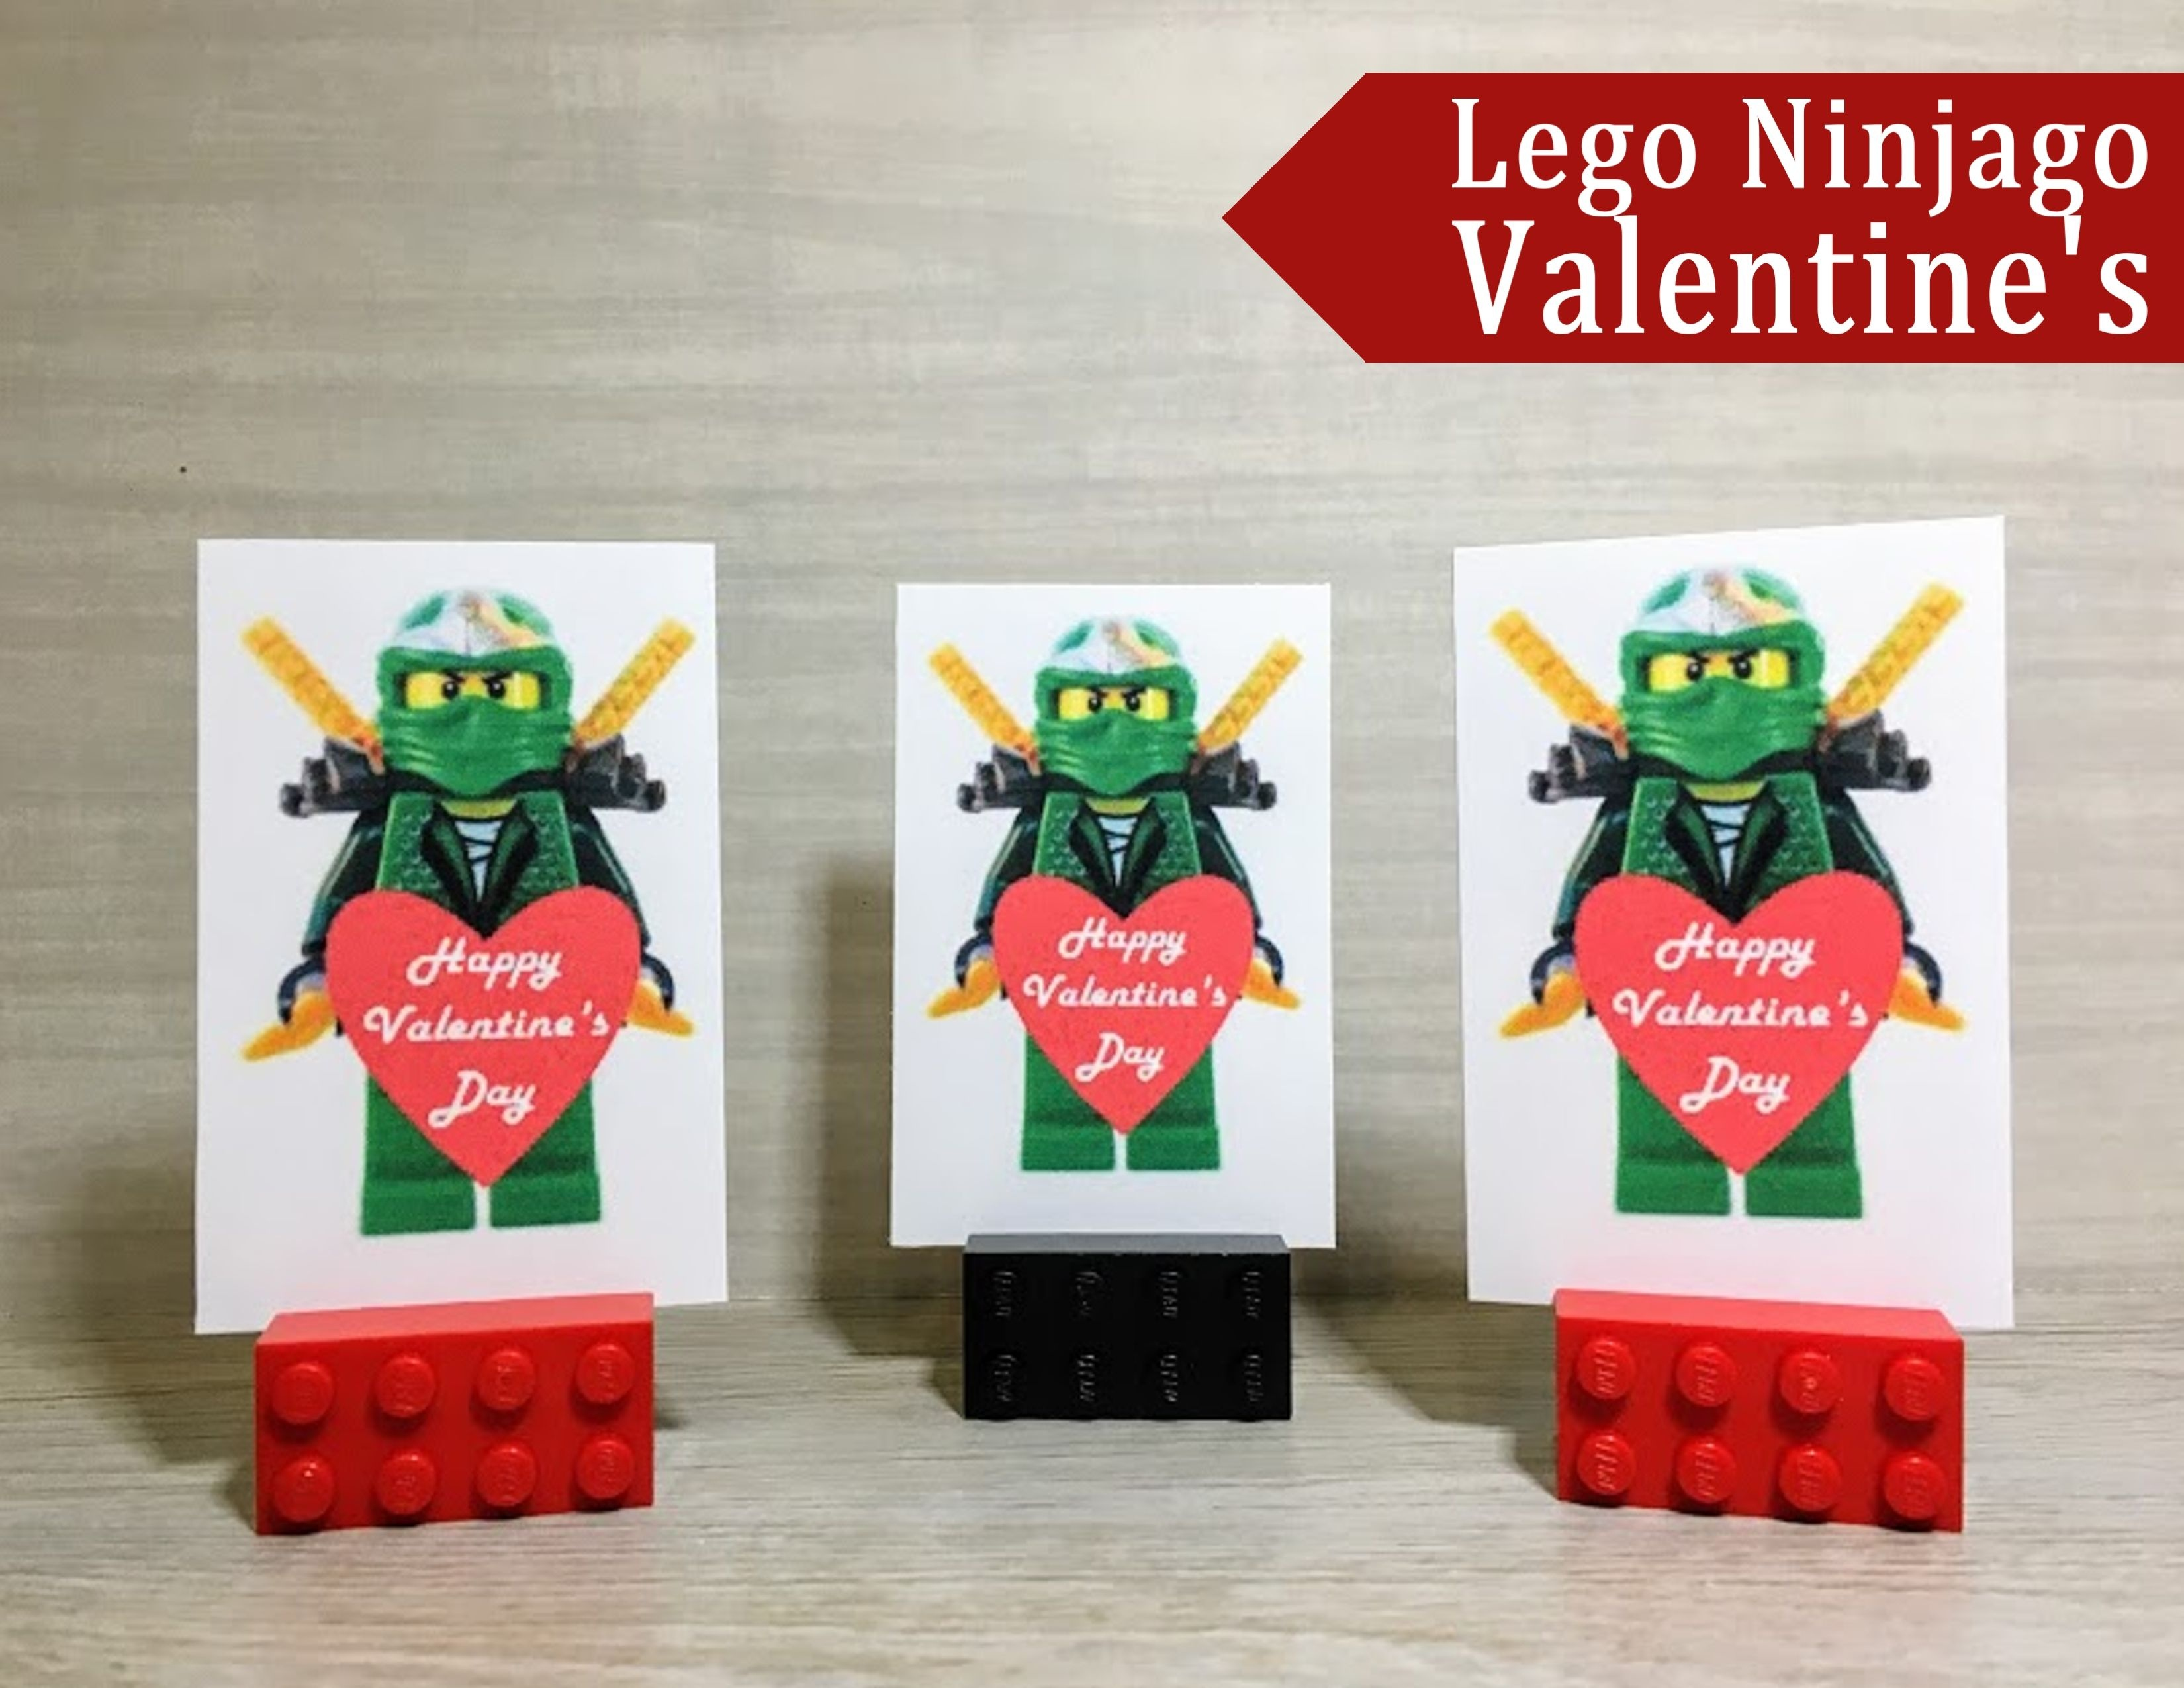 Lego Valentine's Day Figures | Printables4Mom - Free Printables - Free Printable Ninjago Valentine Cards